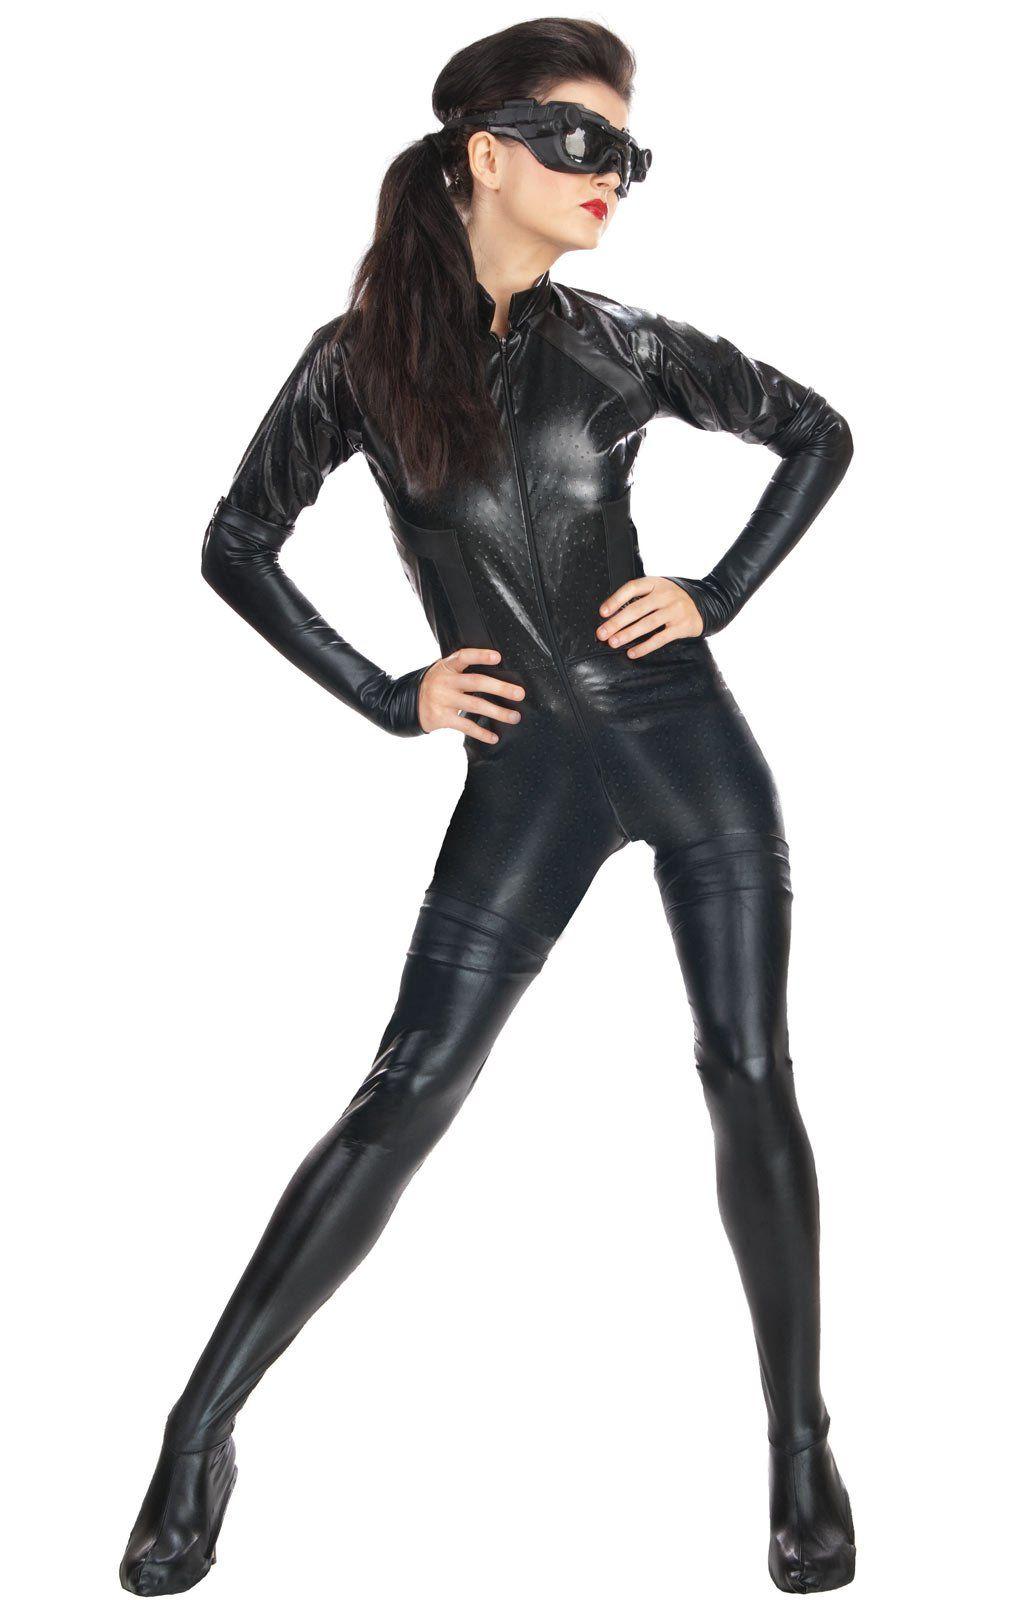 Batman The Dark Knight Rises Catwoman Grand Heritage Adult Costume  sc 1 st  Pinterest & Batman The Dark Knight Rises Catwoman Grand Heritage Adult Costume ...